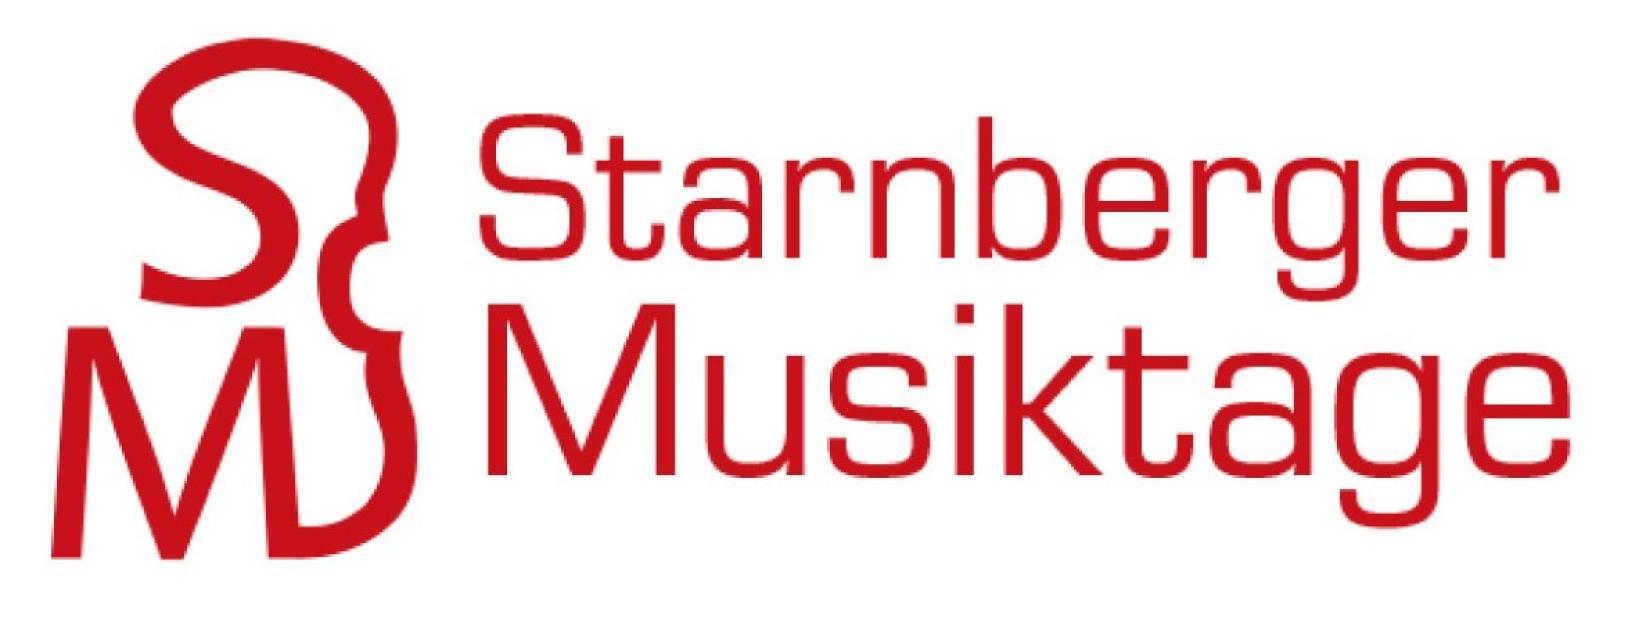 Starnberger Musiktage 2019 - © Rudens Tukur